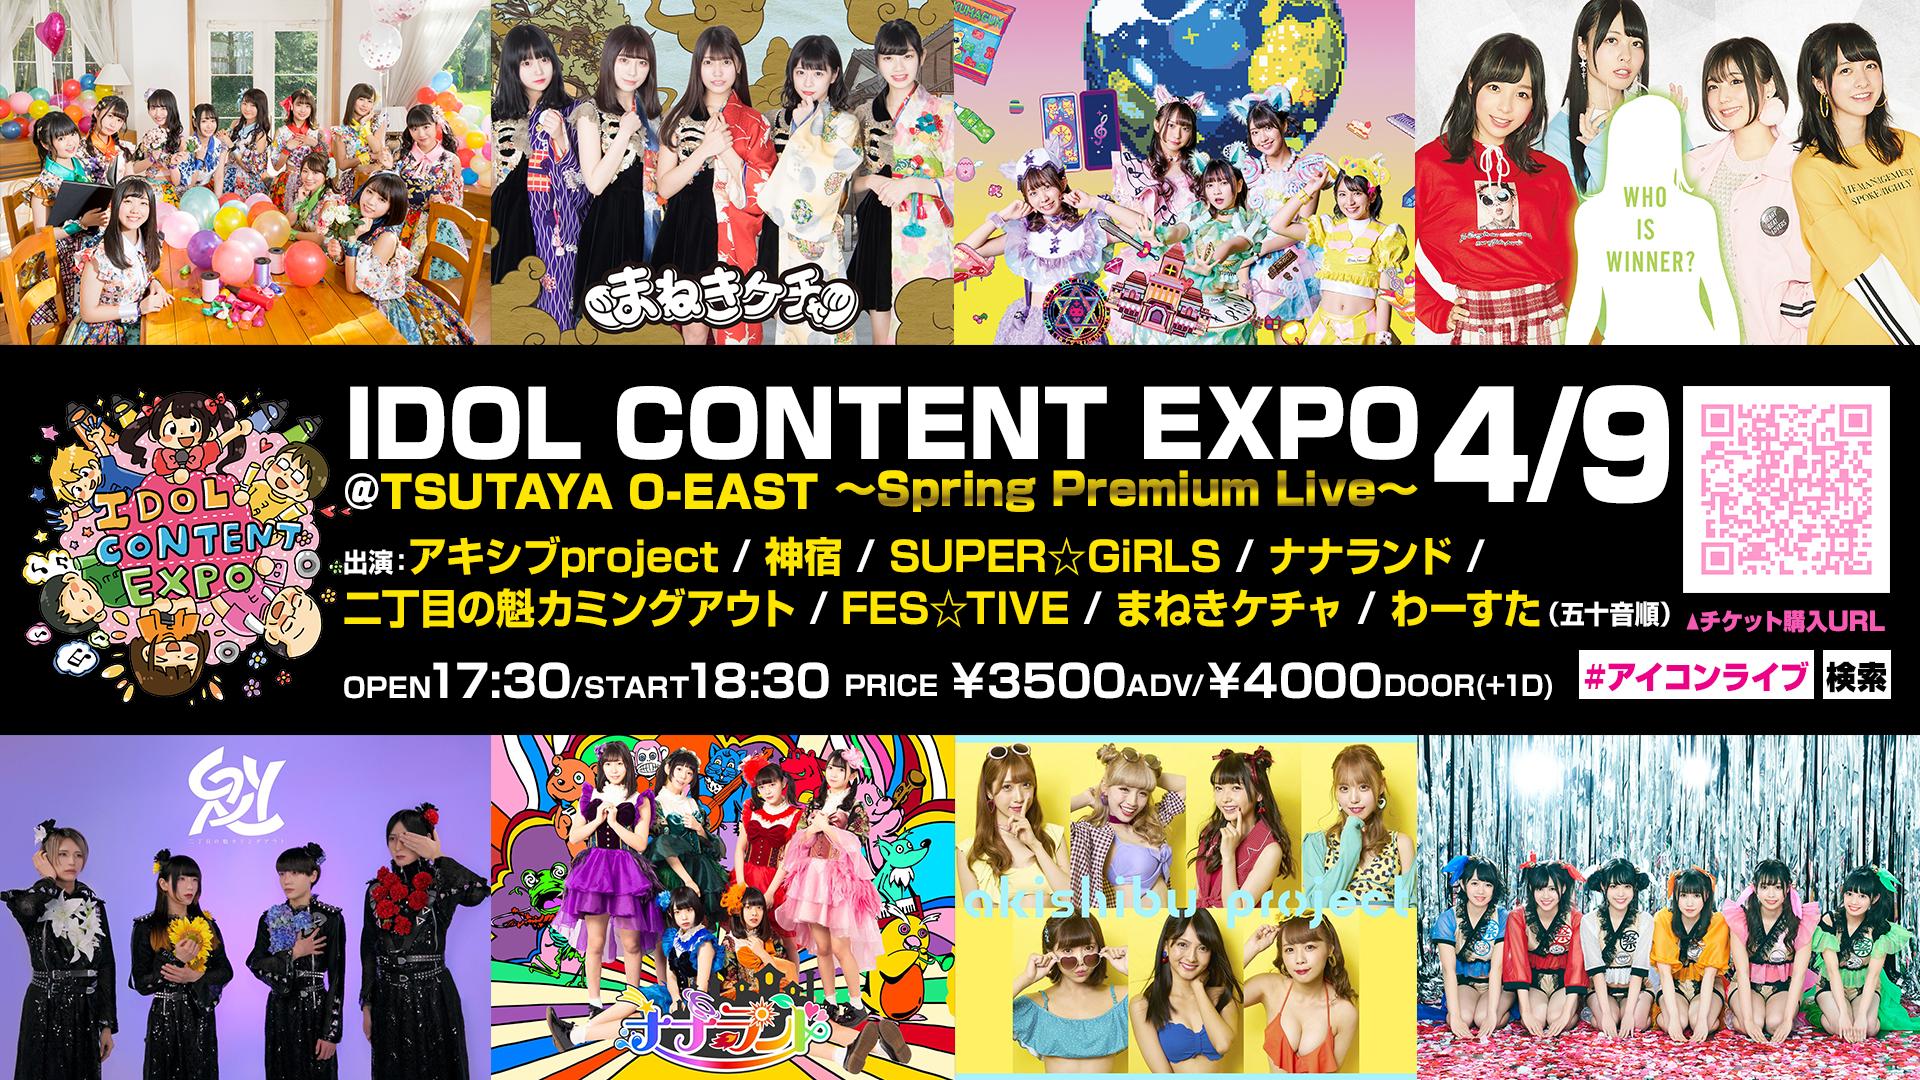 『 IDOL CONTENT EXPO @TSUTAYA O-EAST ~Spring Premium Live~ 』